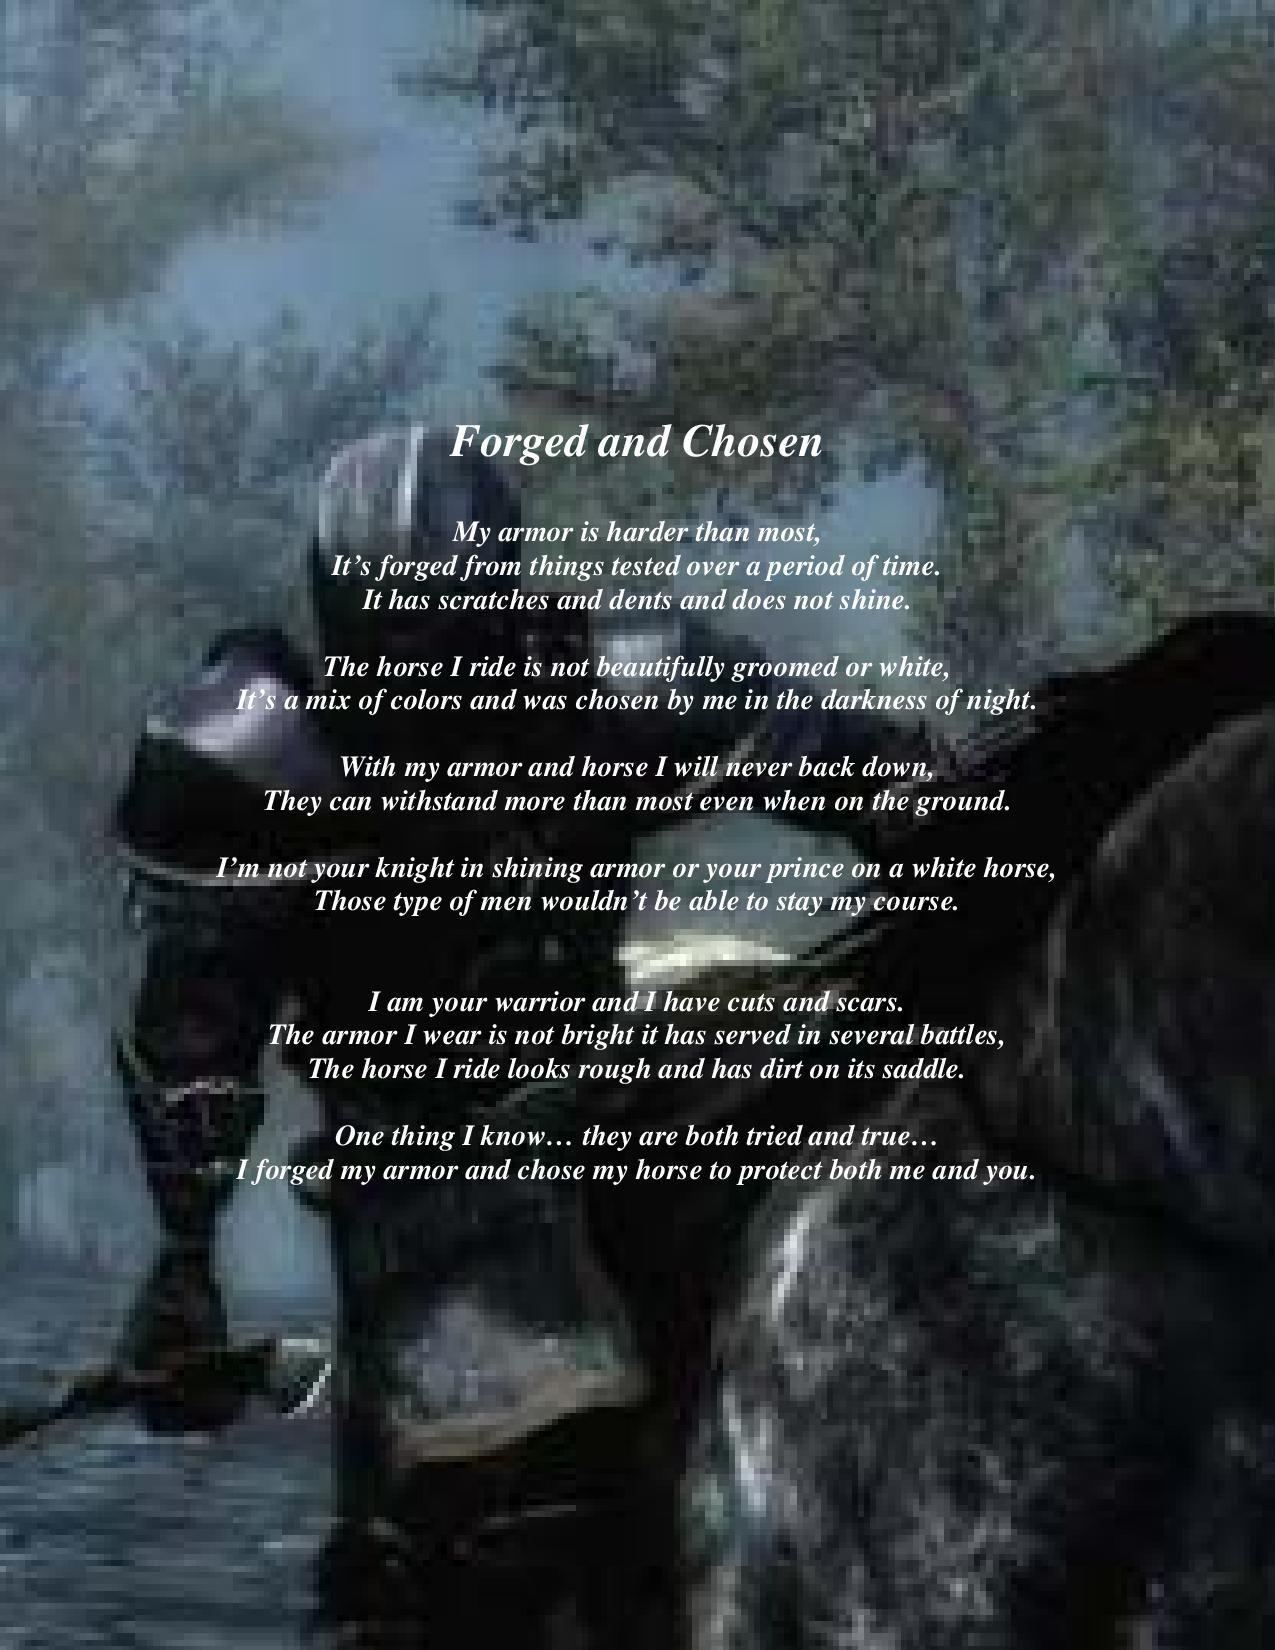 daimyo and samurai relationship poems